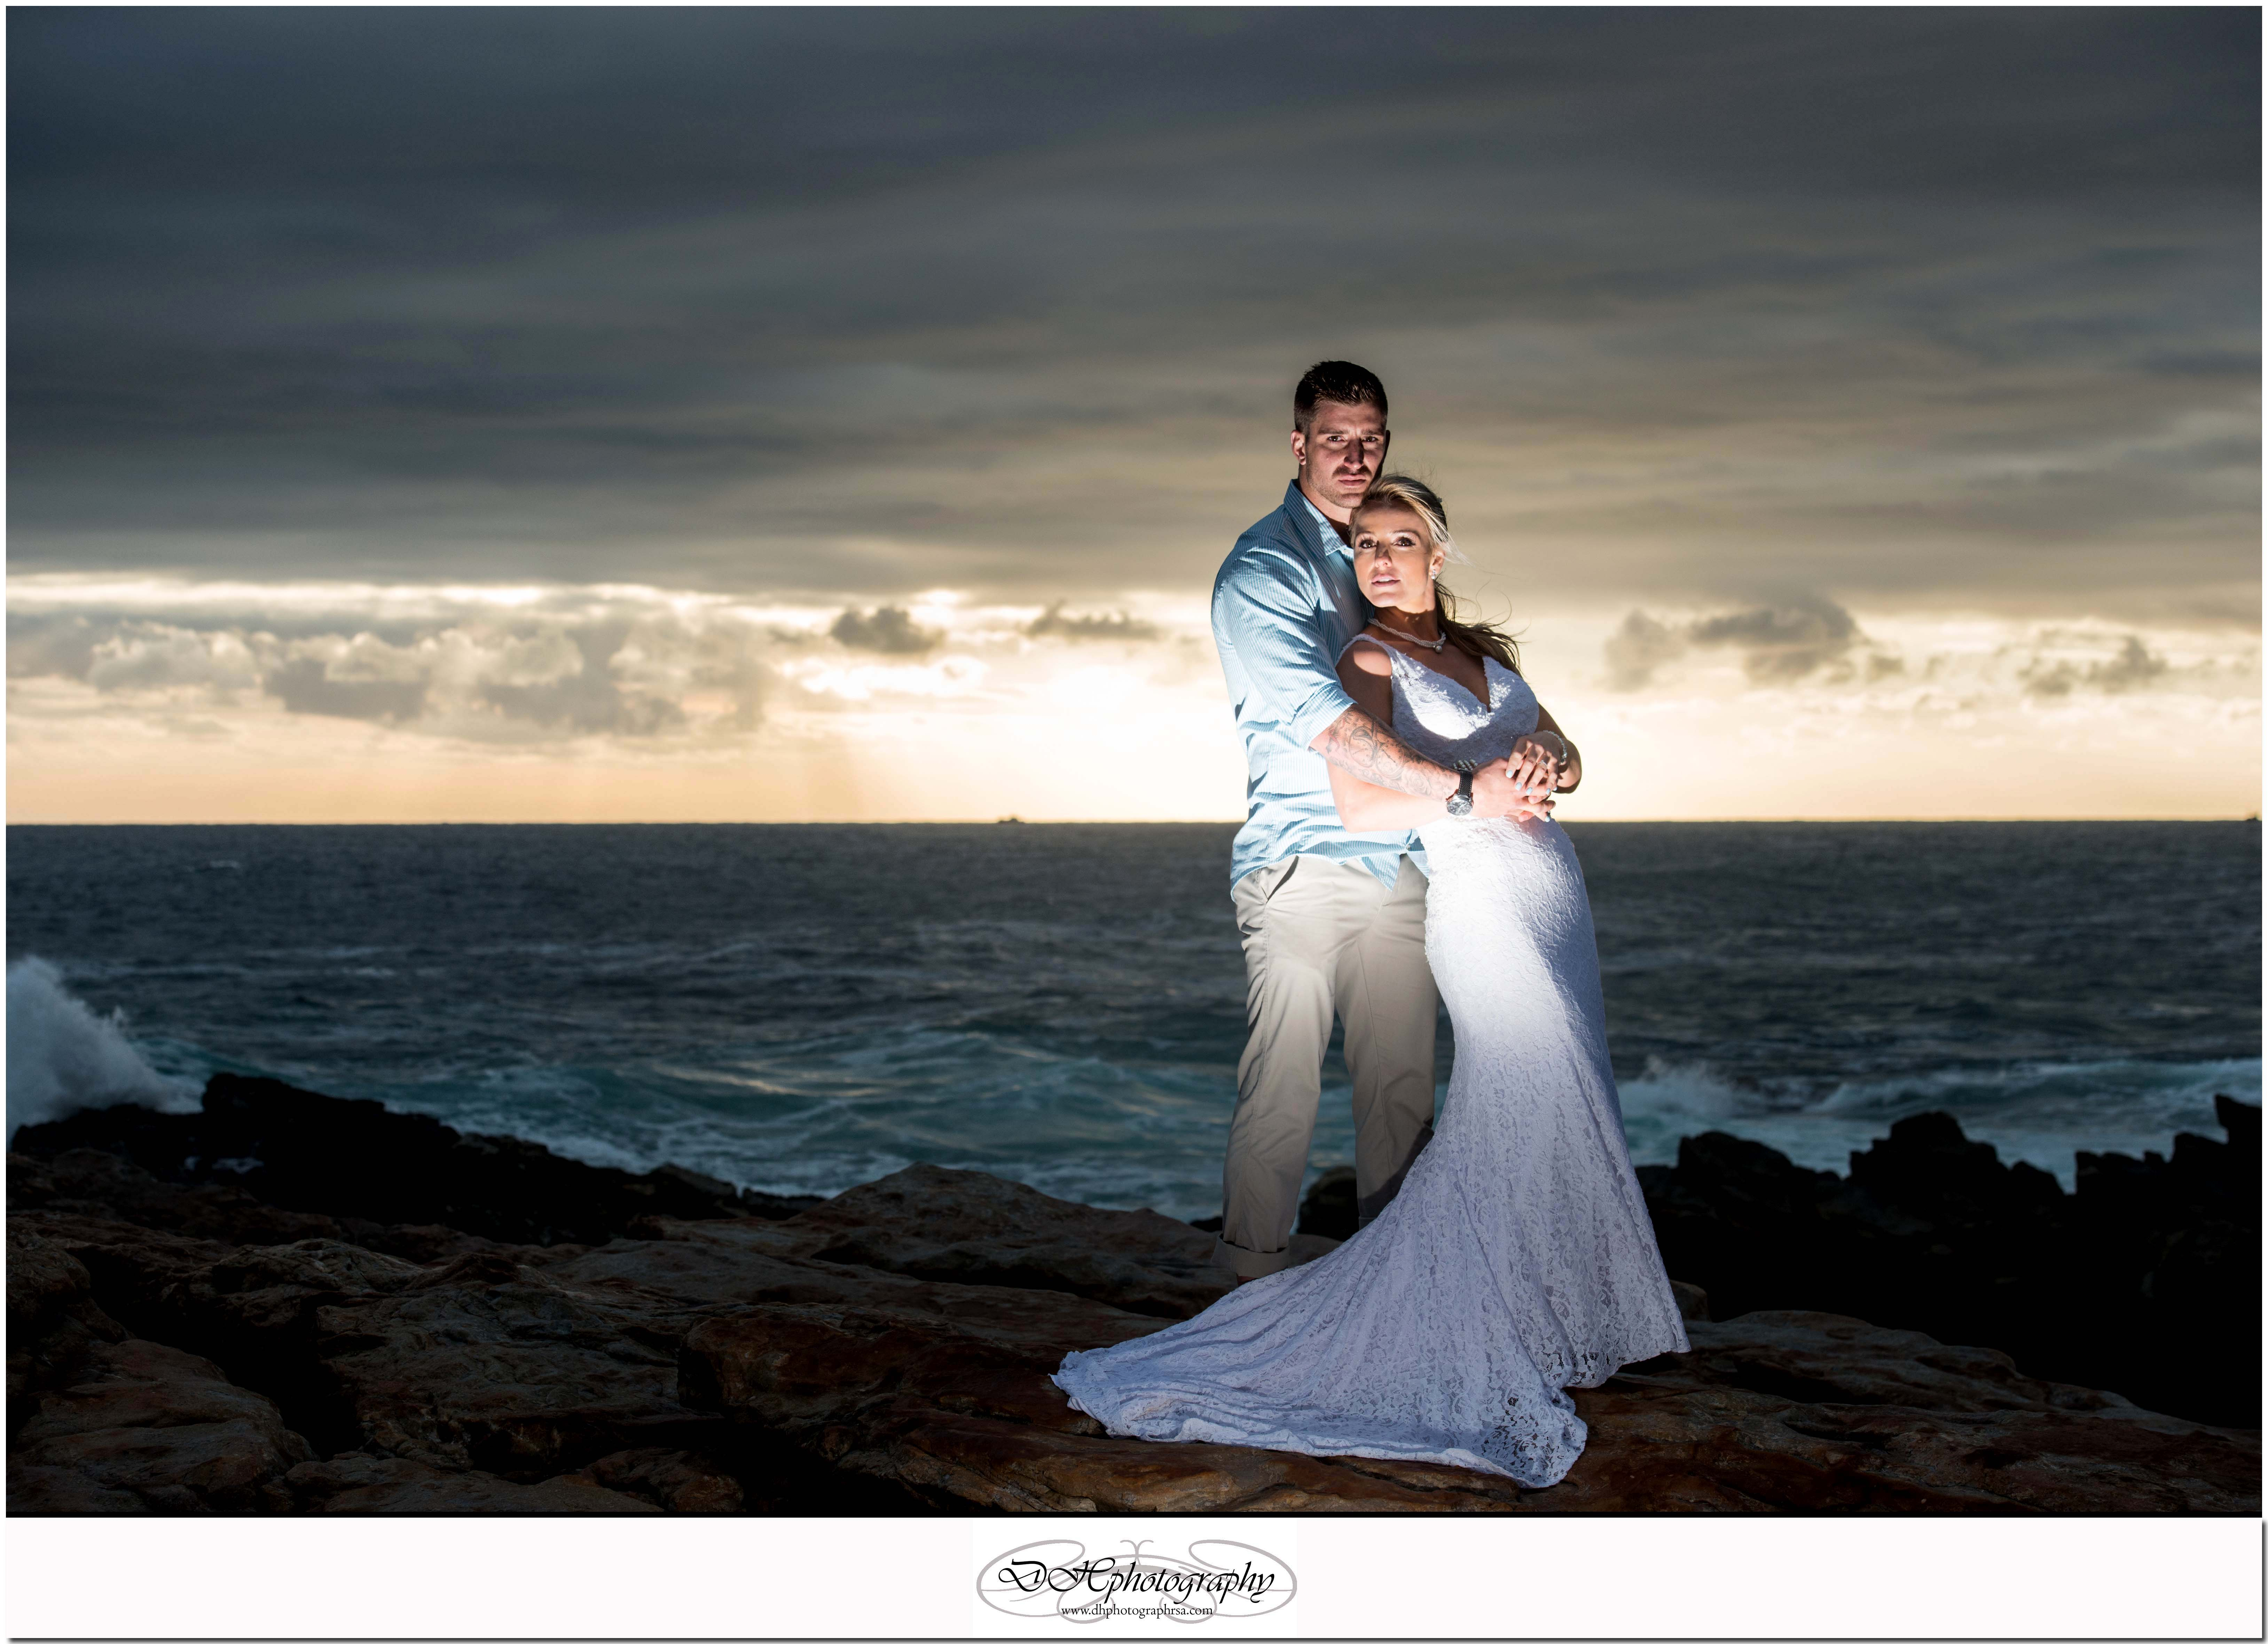 DHPhotography Jeffrey's Bay Photographers Groom & Bride seascapel